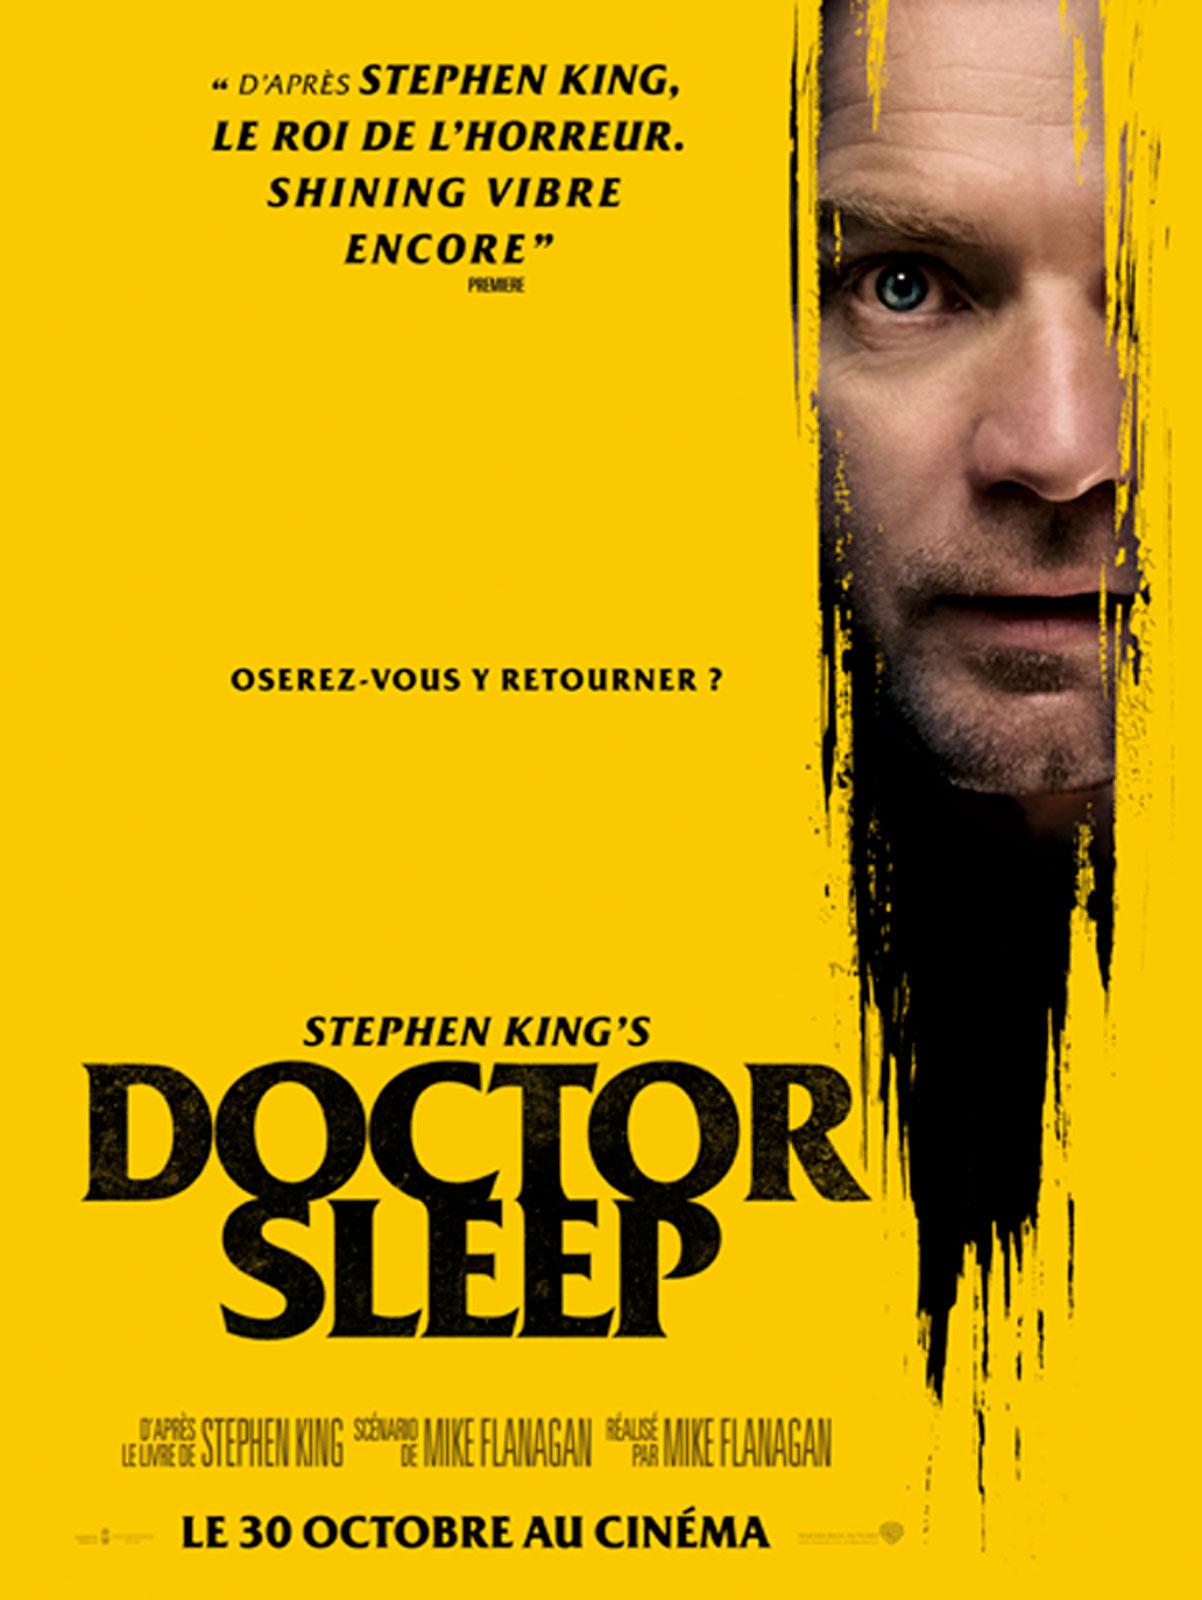 Image du film Stephen King's Doctor Sleep